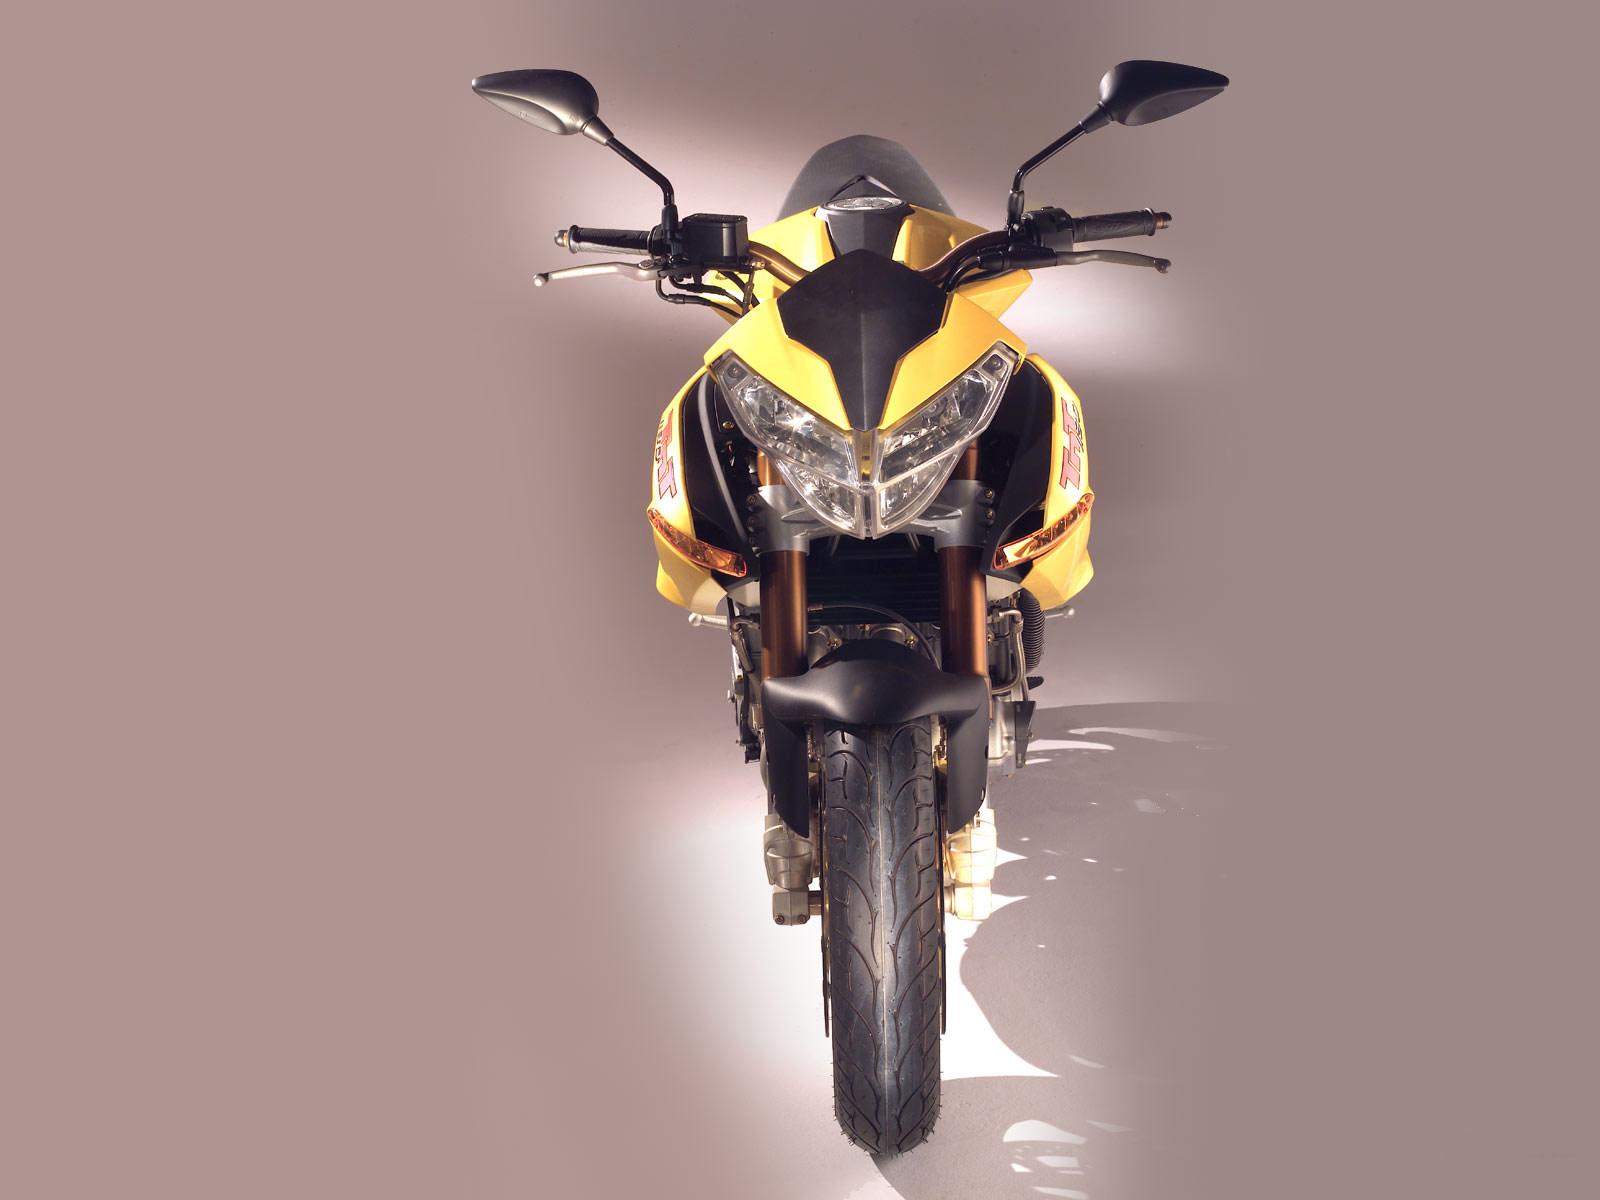 http://1.bp.blogspot.com/-t38mf1wd3P4/Tr28zUniJtI/AAAAAAAADww/FIRobkNgi4I/s1600/2005_Benelli-TNT-1130_motorcycle-desktop-wallpaper_05.jpg